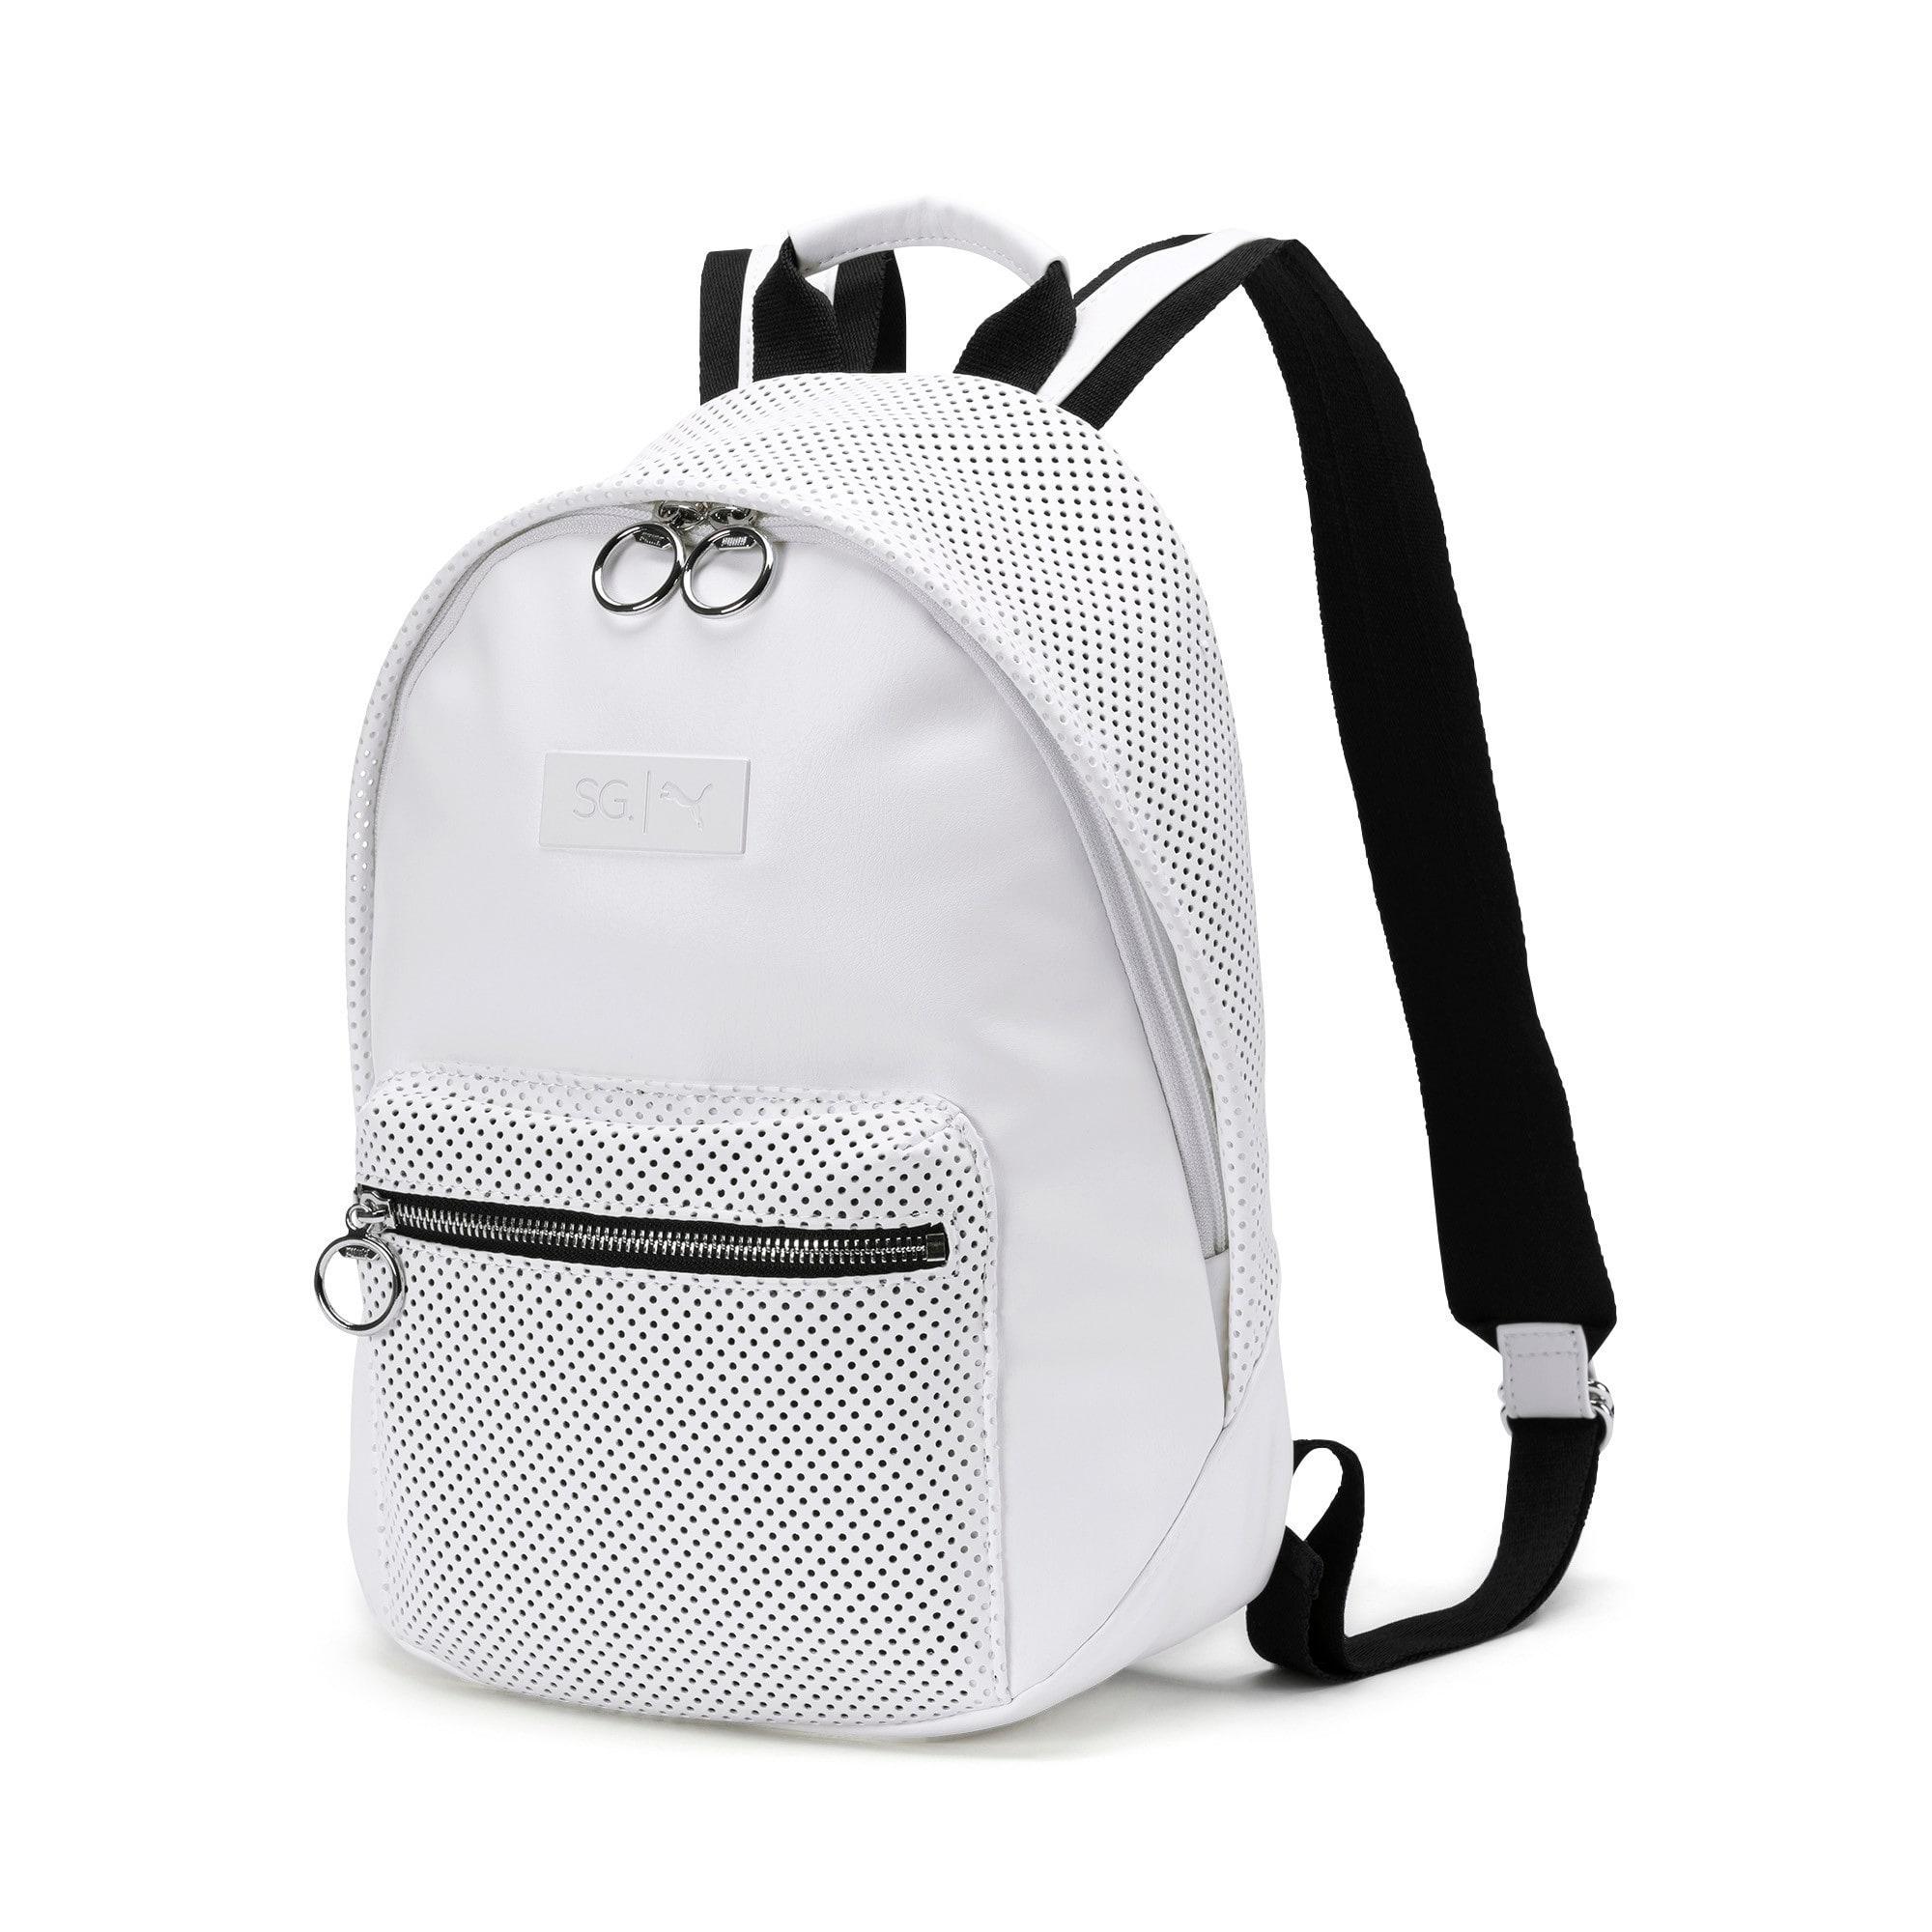 Thumbnail 1 of PUMA x SELENA GOMEZ Style Women's Backpack, Puma White, medium